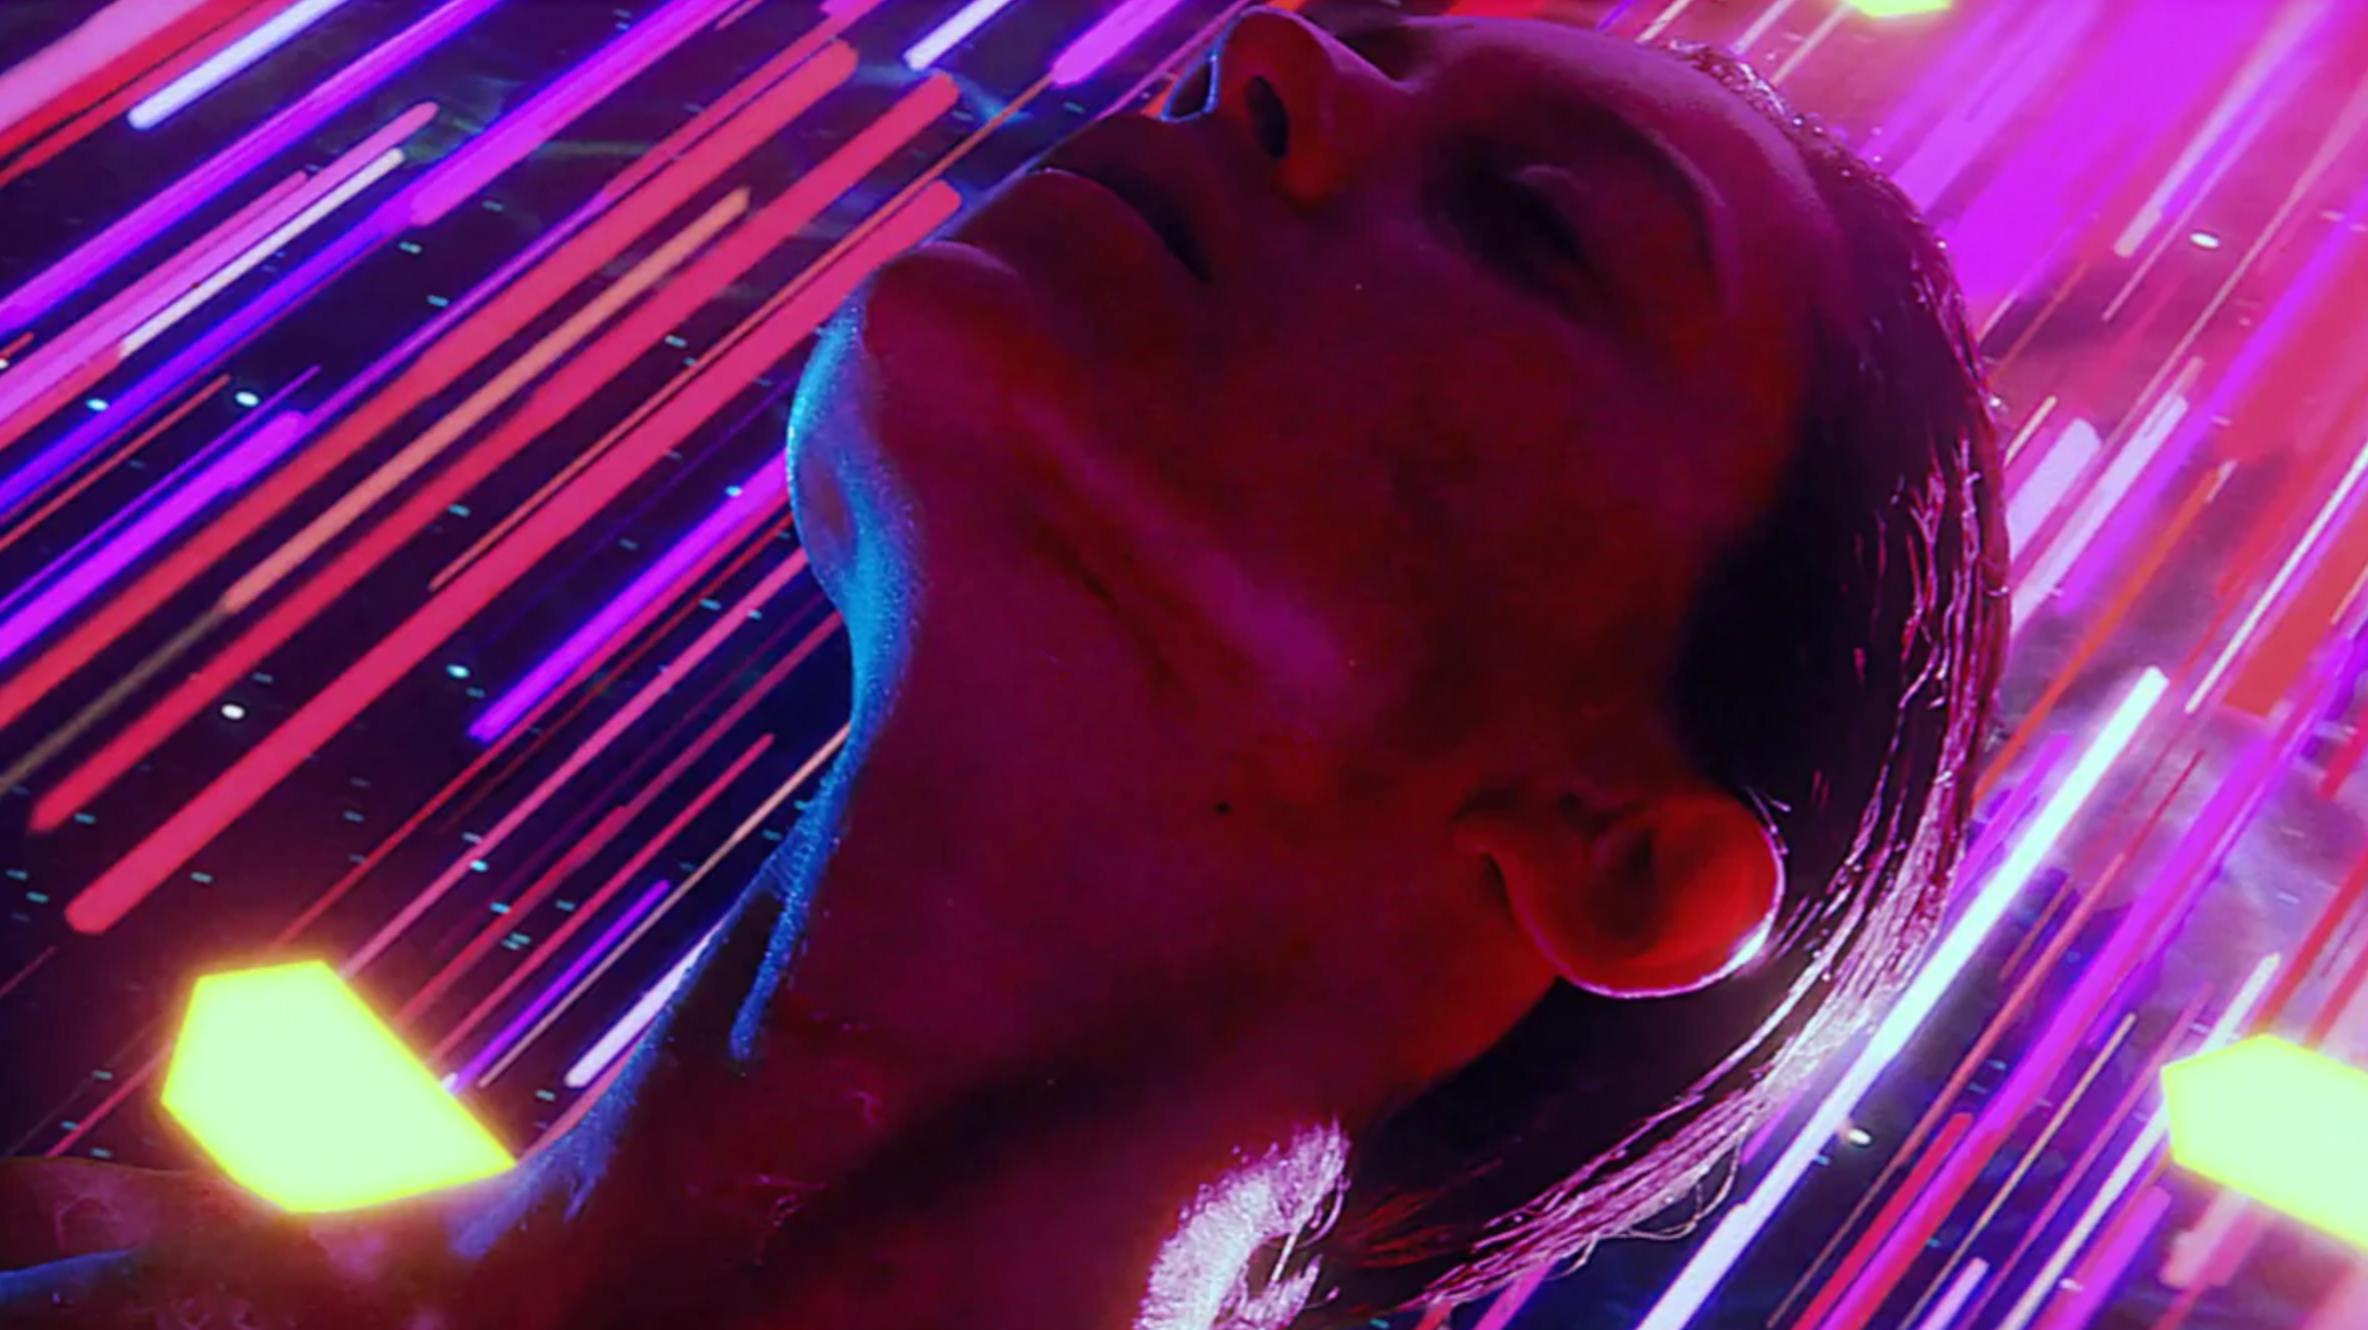 Listen: FANGORIA Frequencies' Weekend Watch is Shudder's 'Blood Machines'